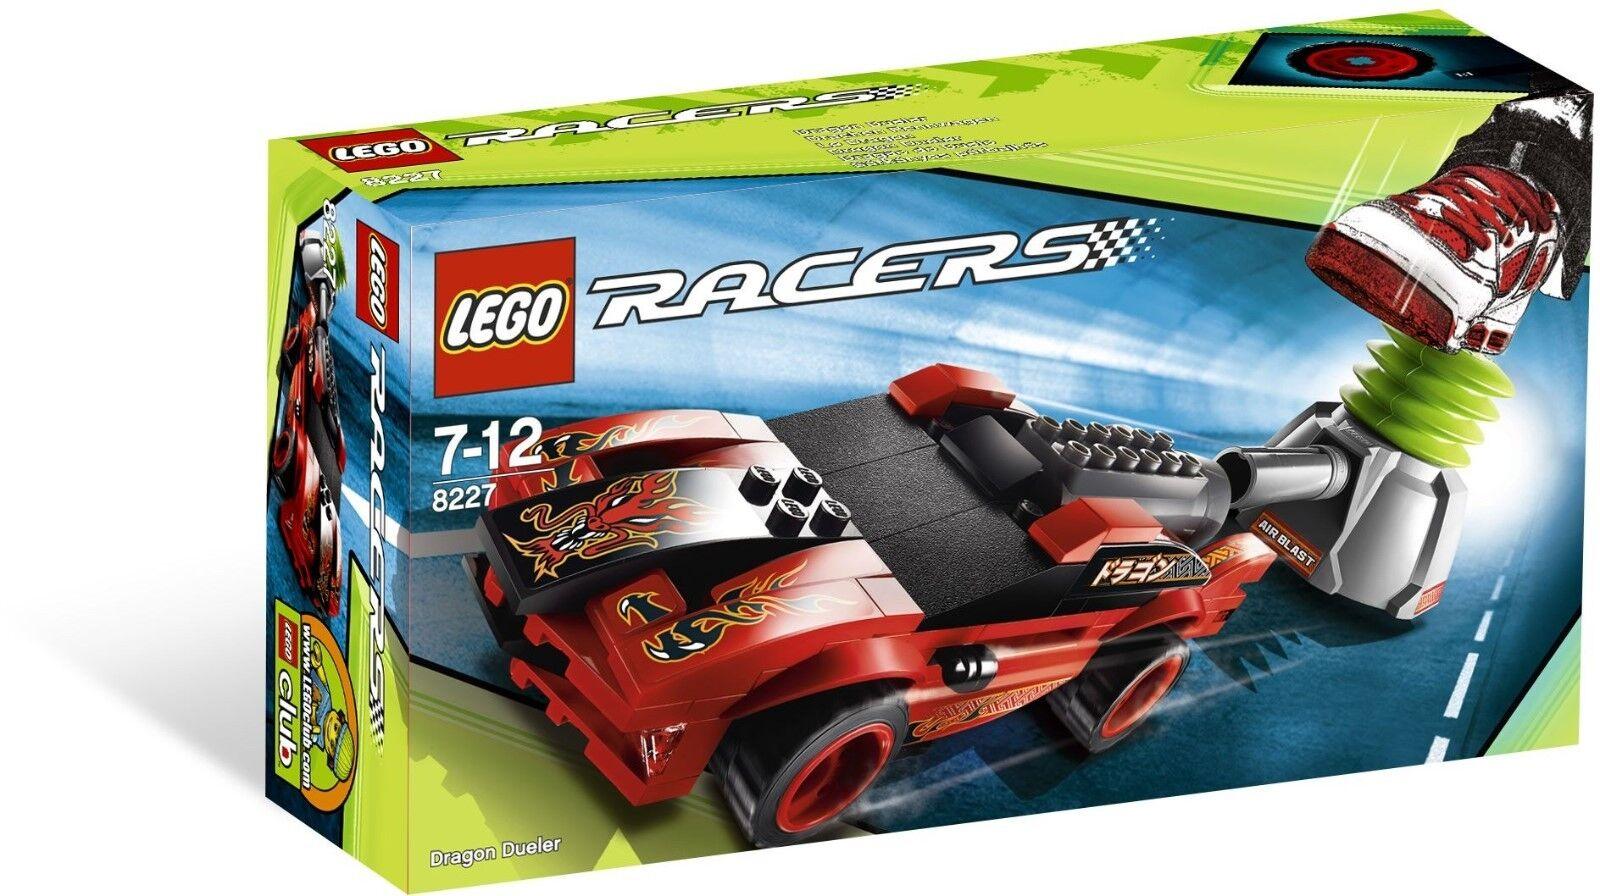 LEGO Racers Dragon Dueller - 8227 - BRAND NEW